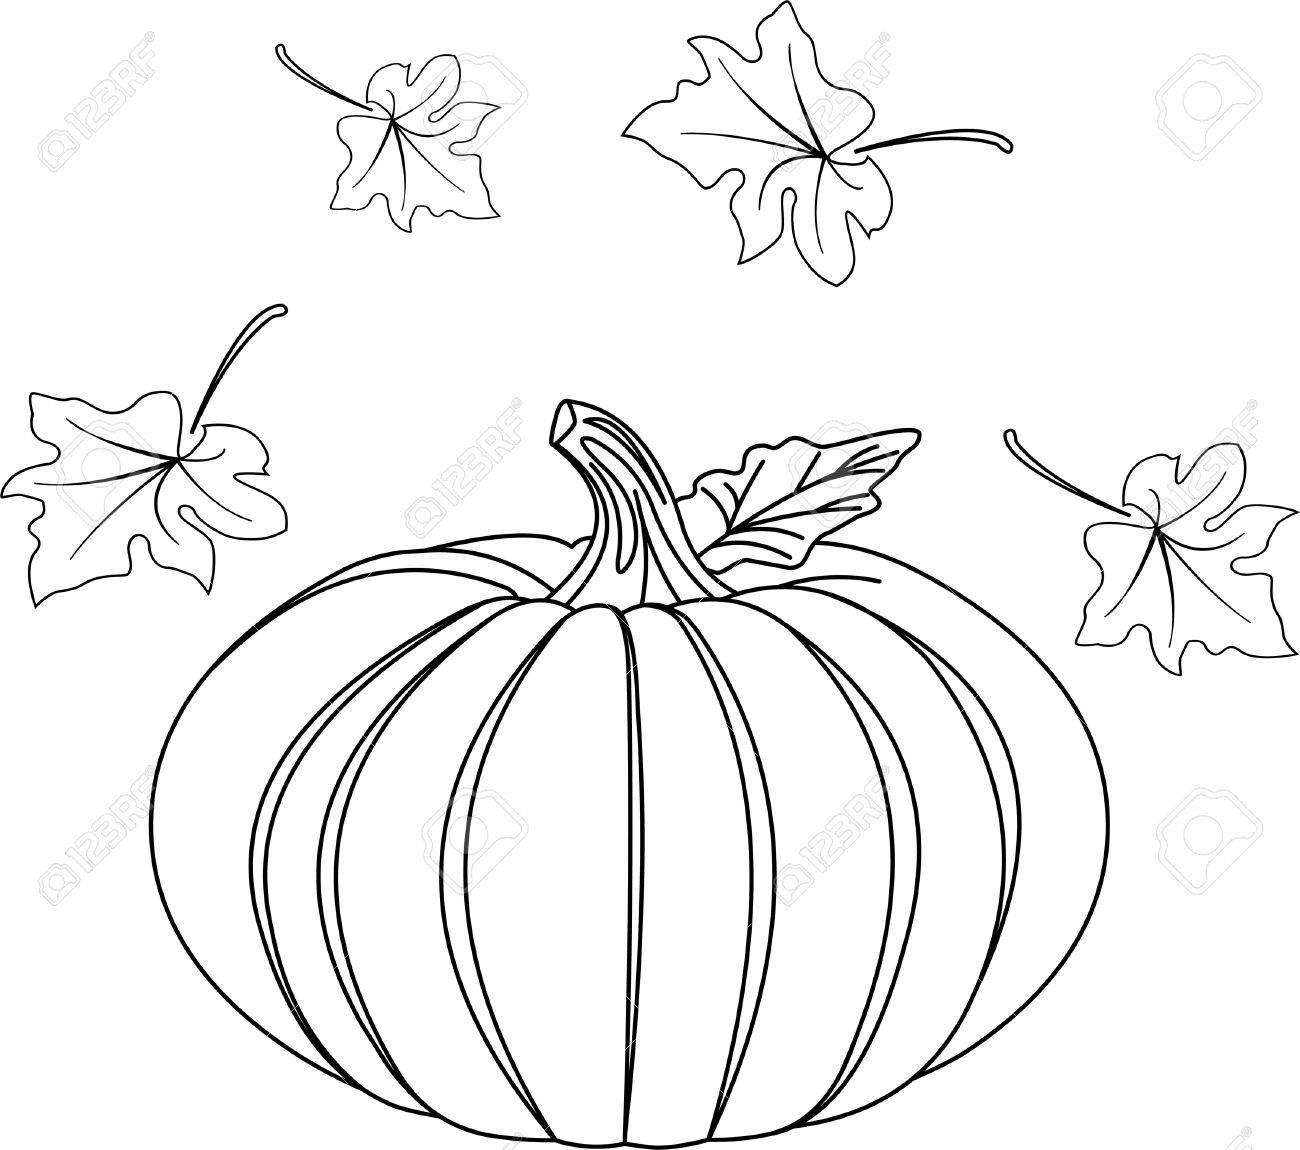 751 coloring pumpkin cliparts stock vector and royalty free